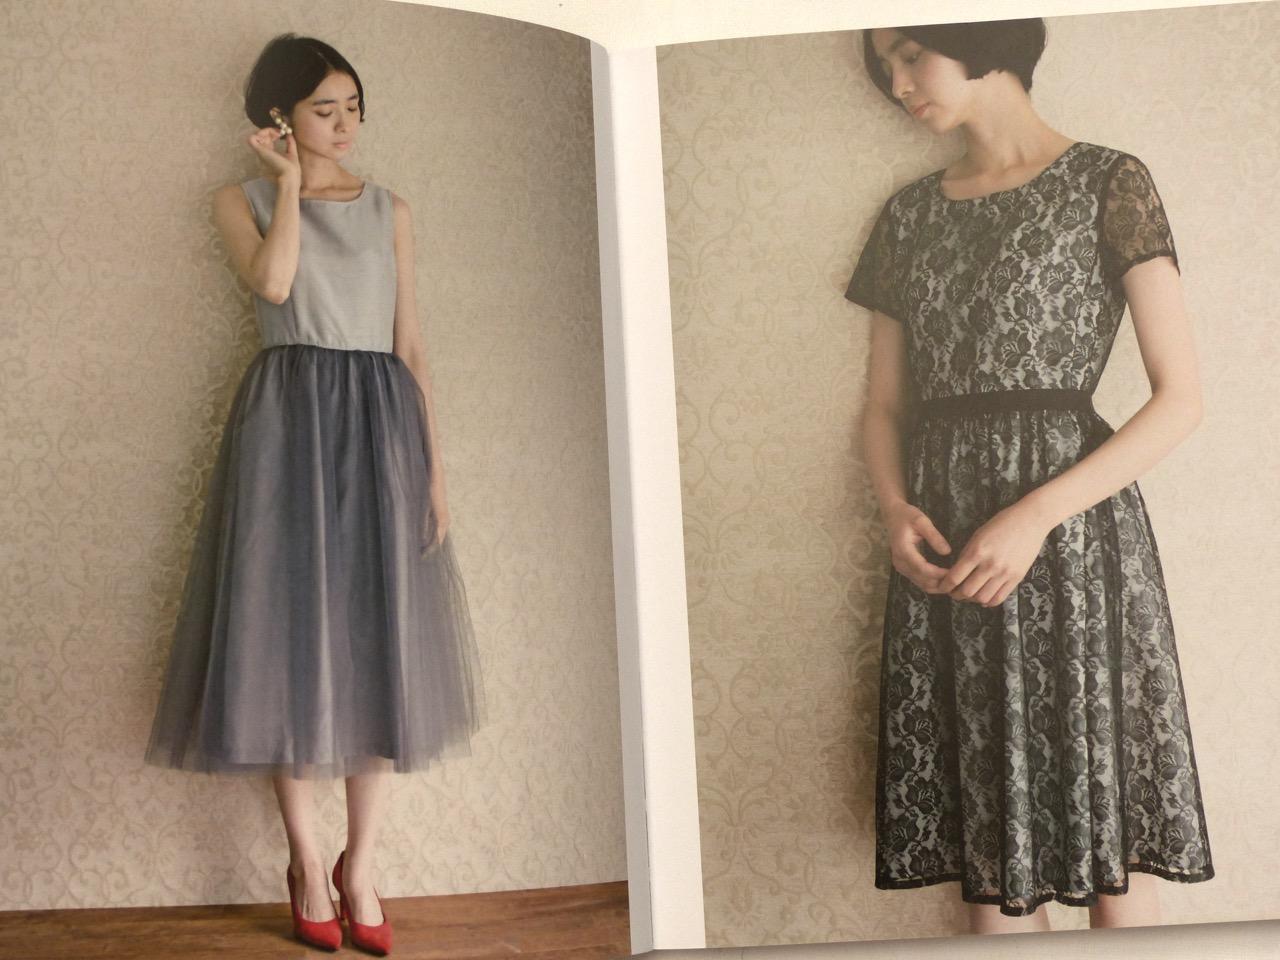 verykerryberry: Stylish Party Dresses by Yoshiko Tsukiori: Review